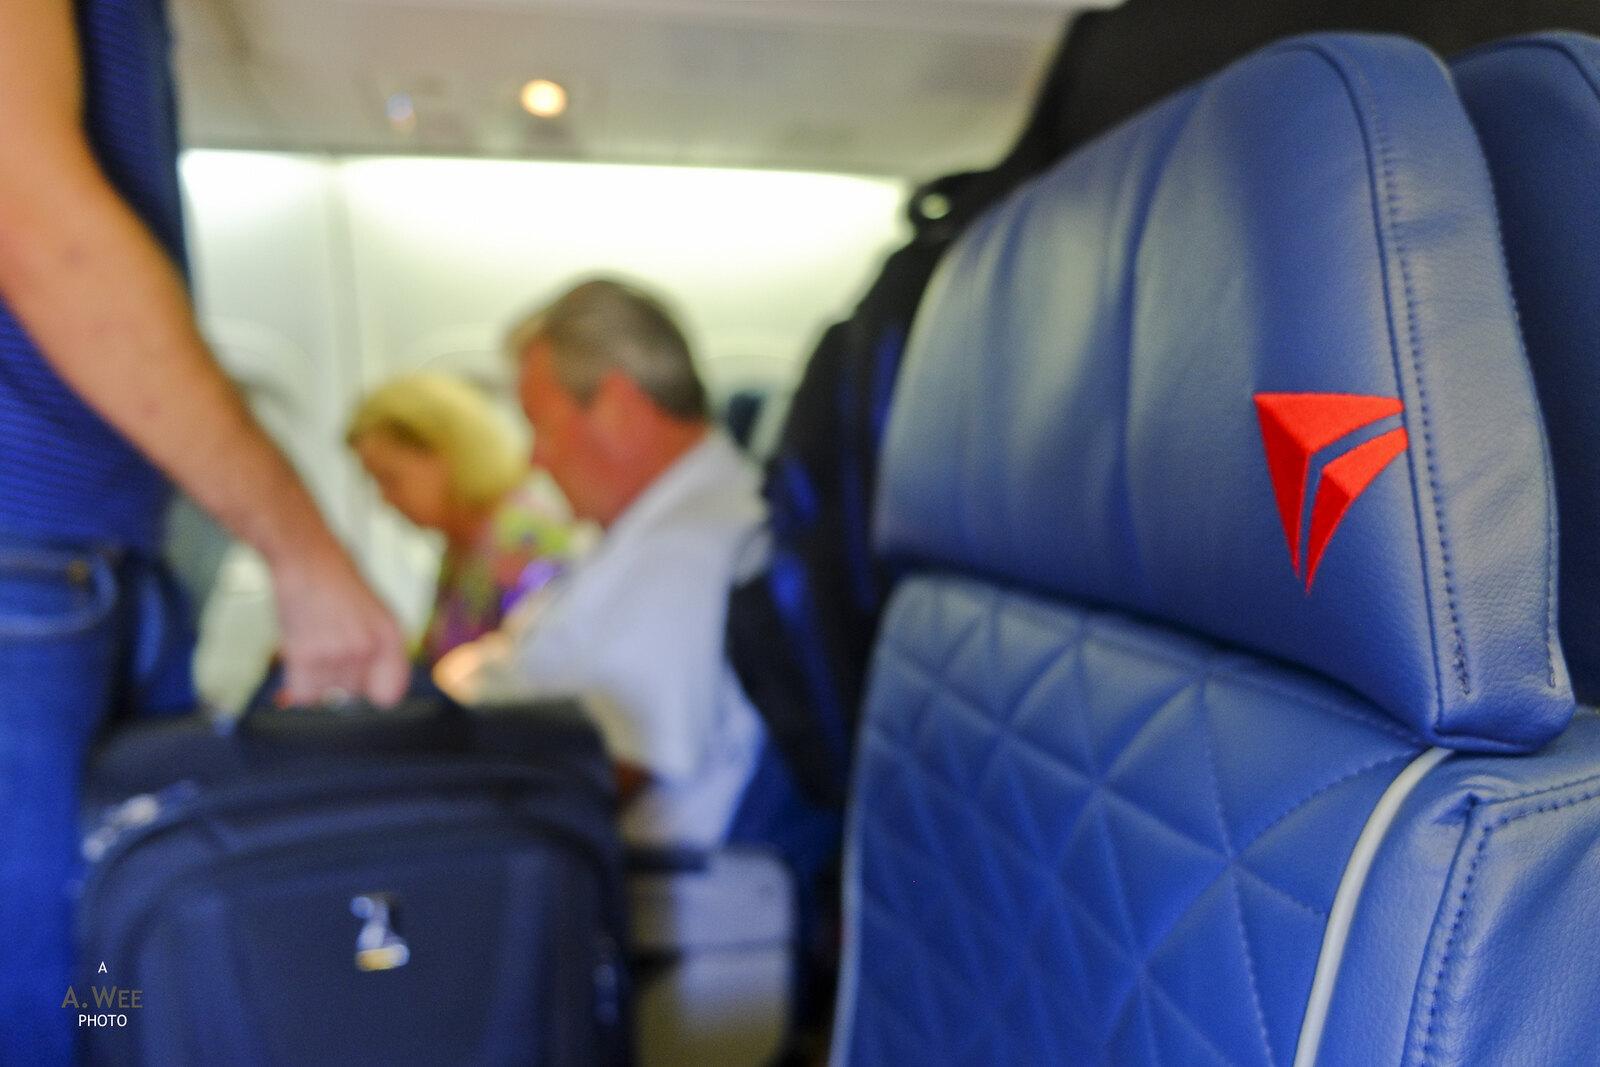 Boarding the plane